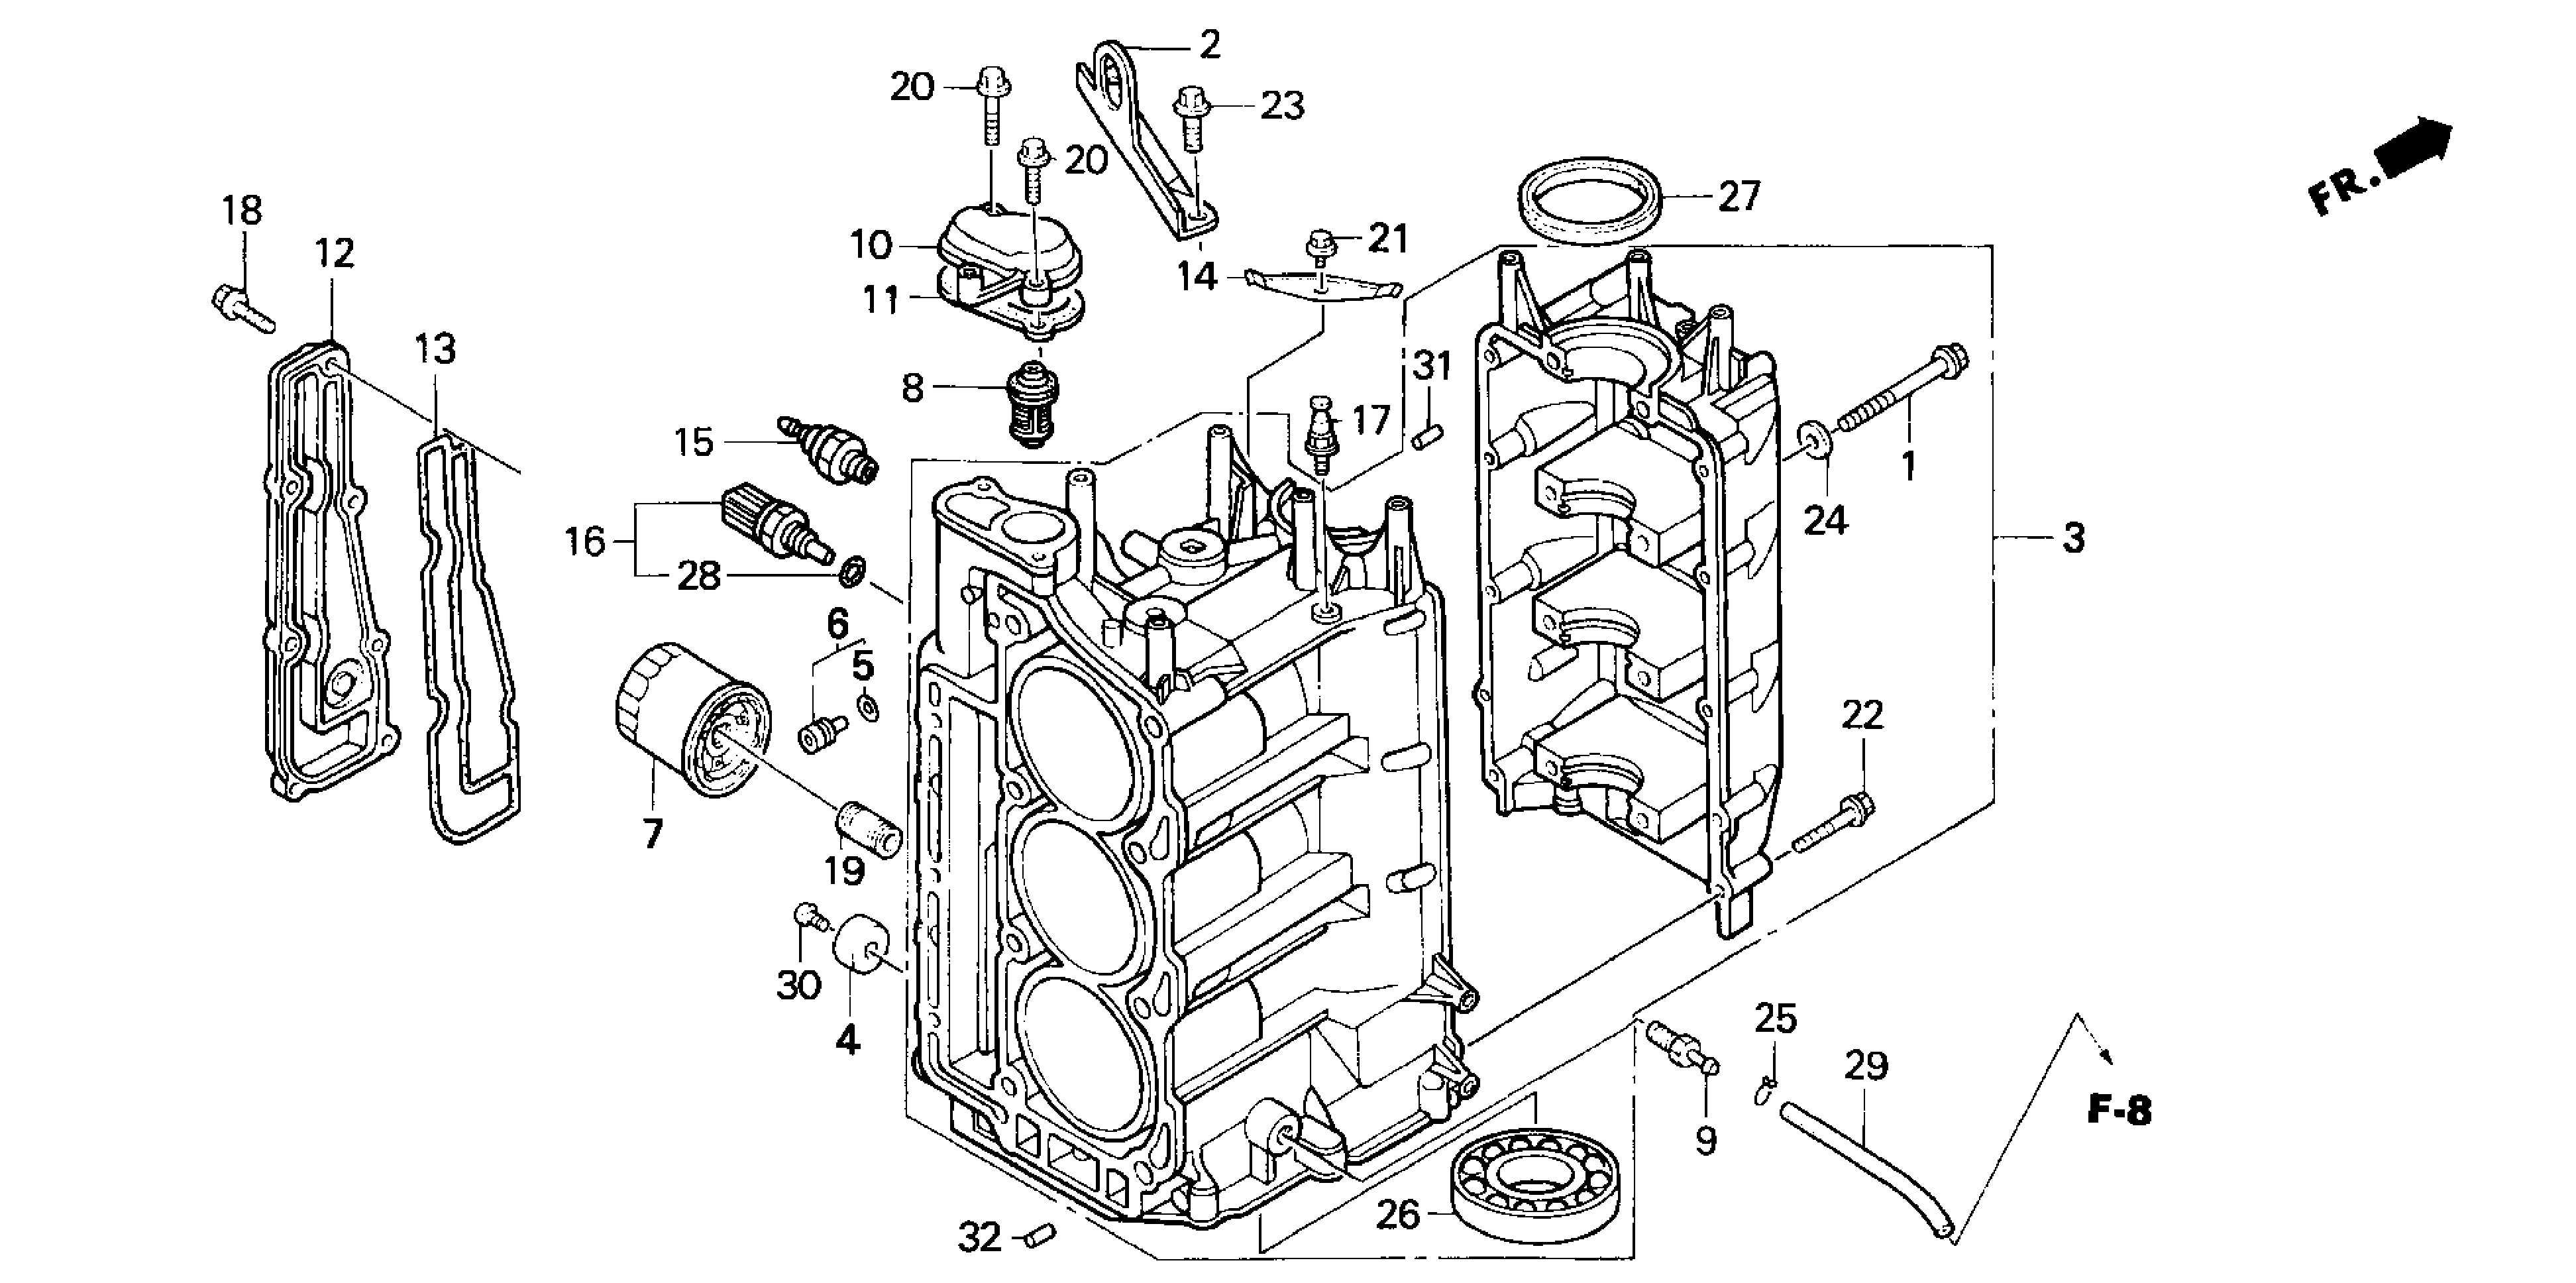 Honda Engine Cooling Diagram The Portal And Forum Of Wiring Atomic 4 Outboard Diagrams Rh 55 Treatchildtrauma De Bmw System Car